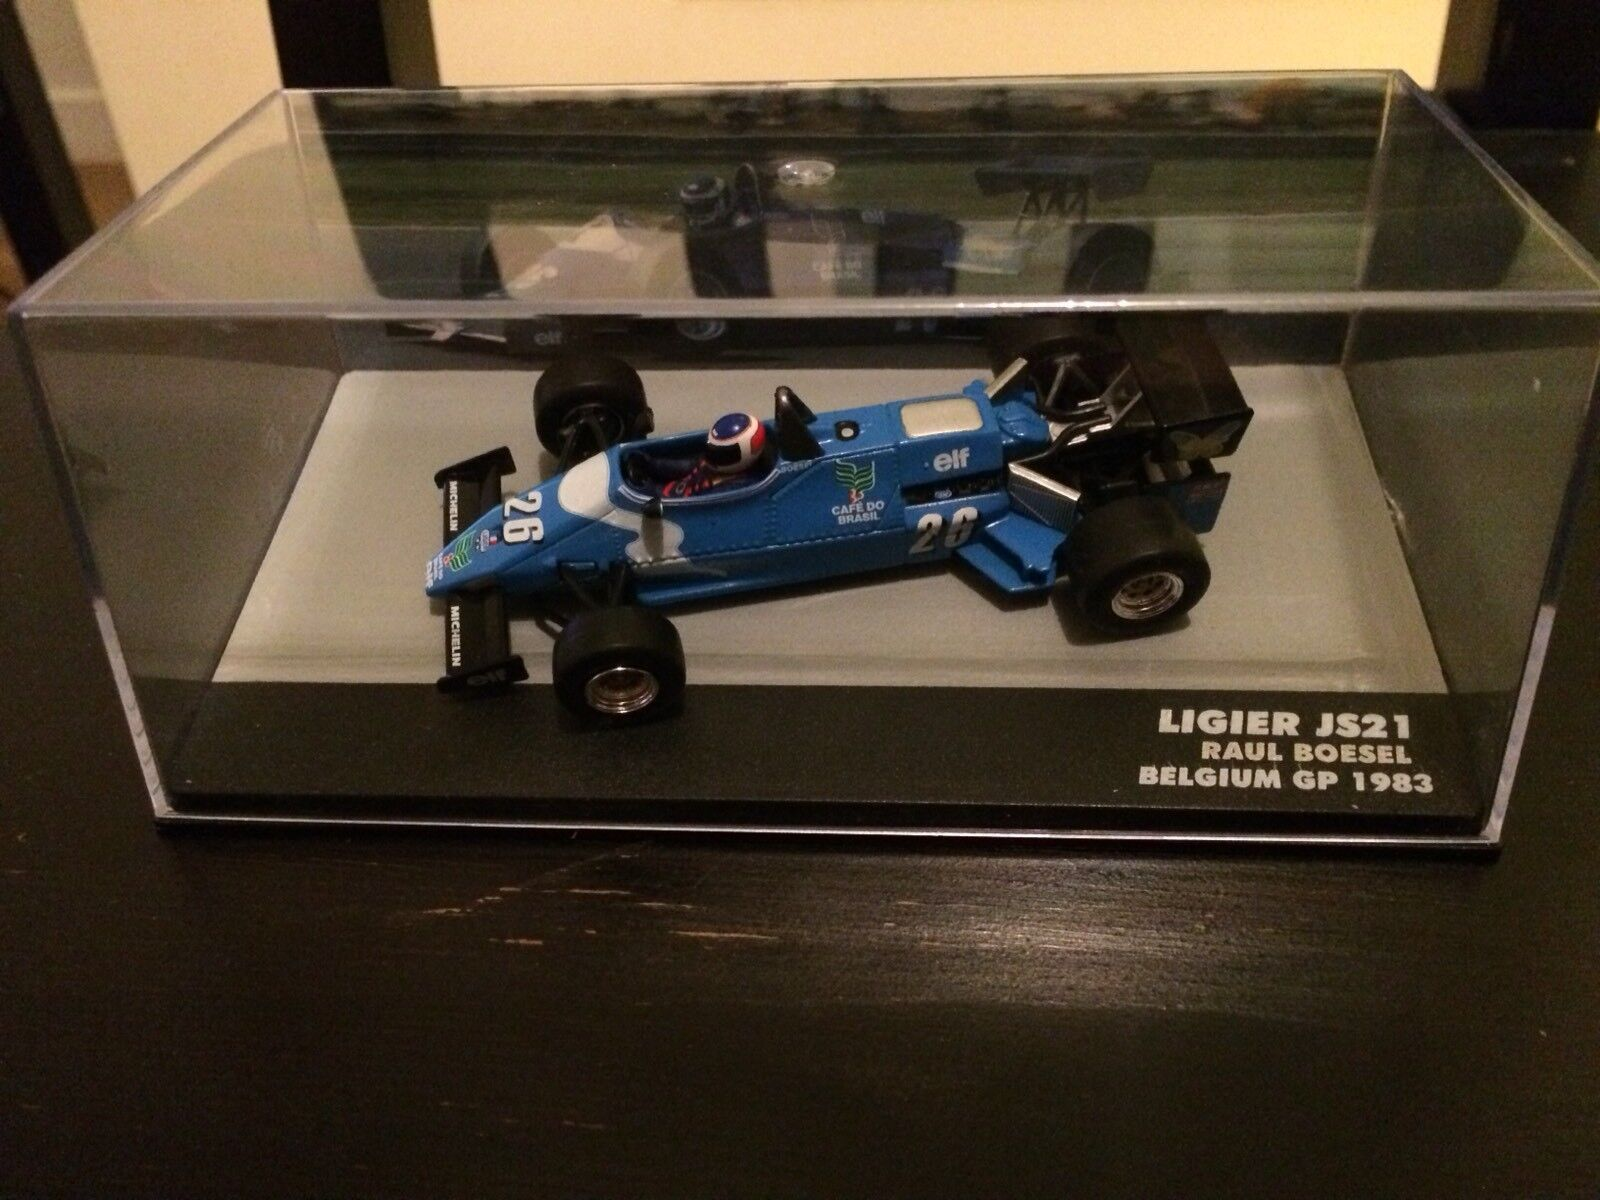 Ligier js 21 Belgium GP 1983 raul Boesel